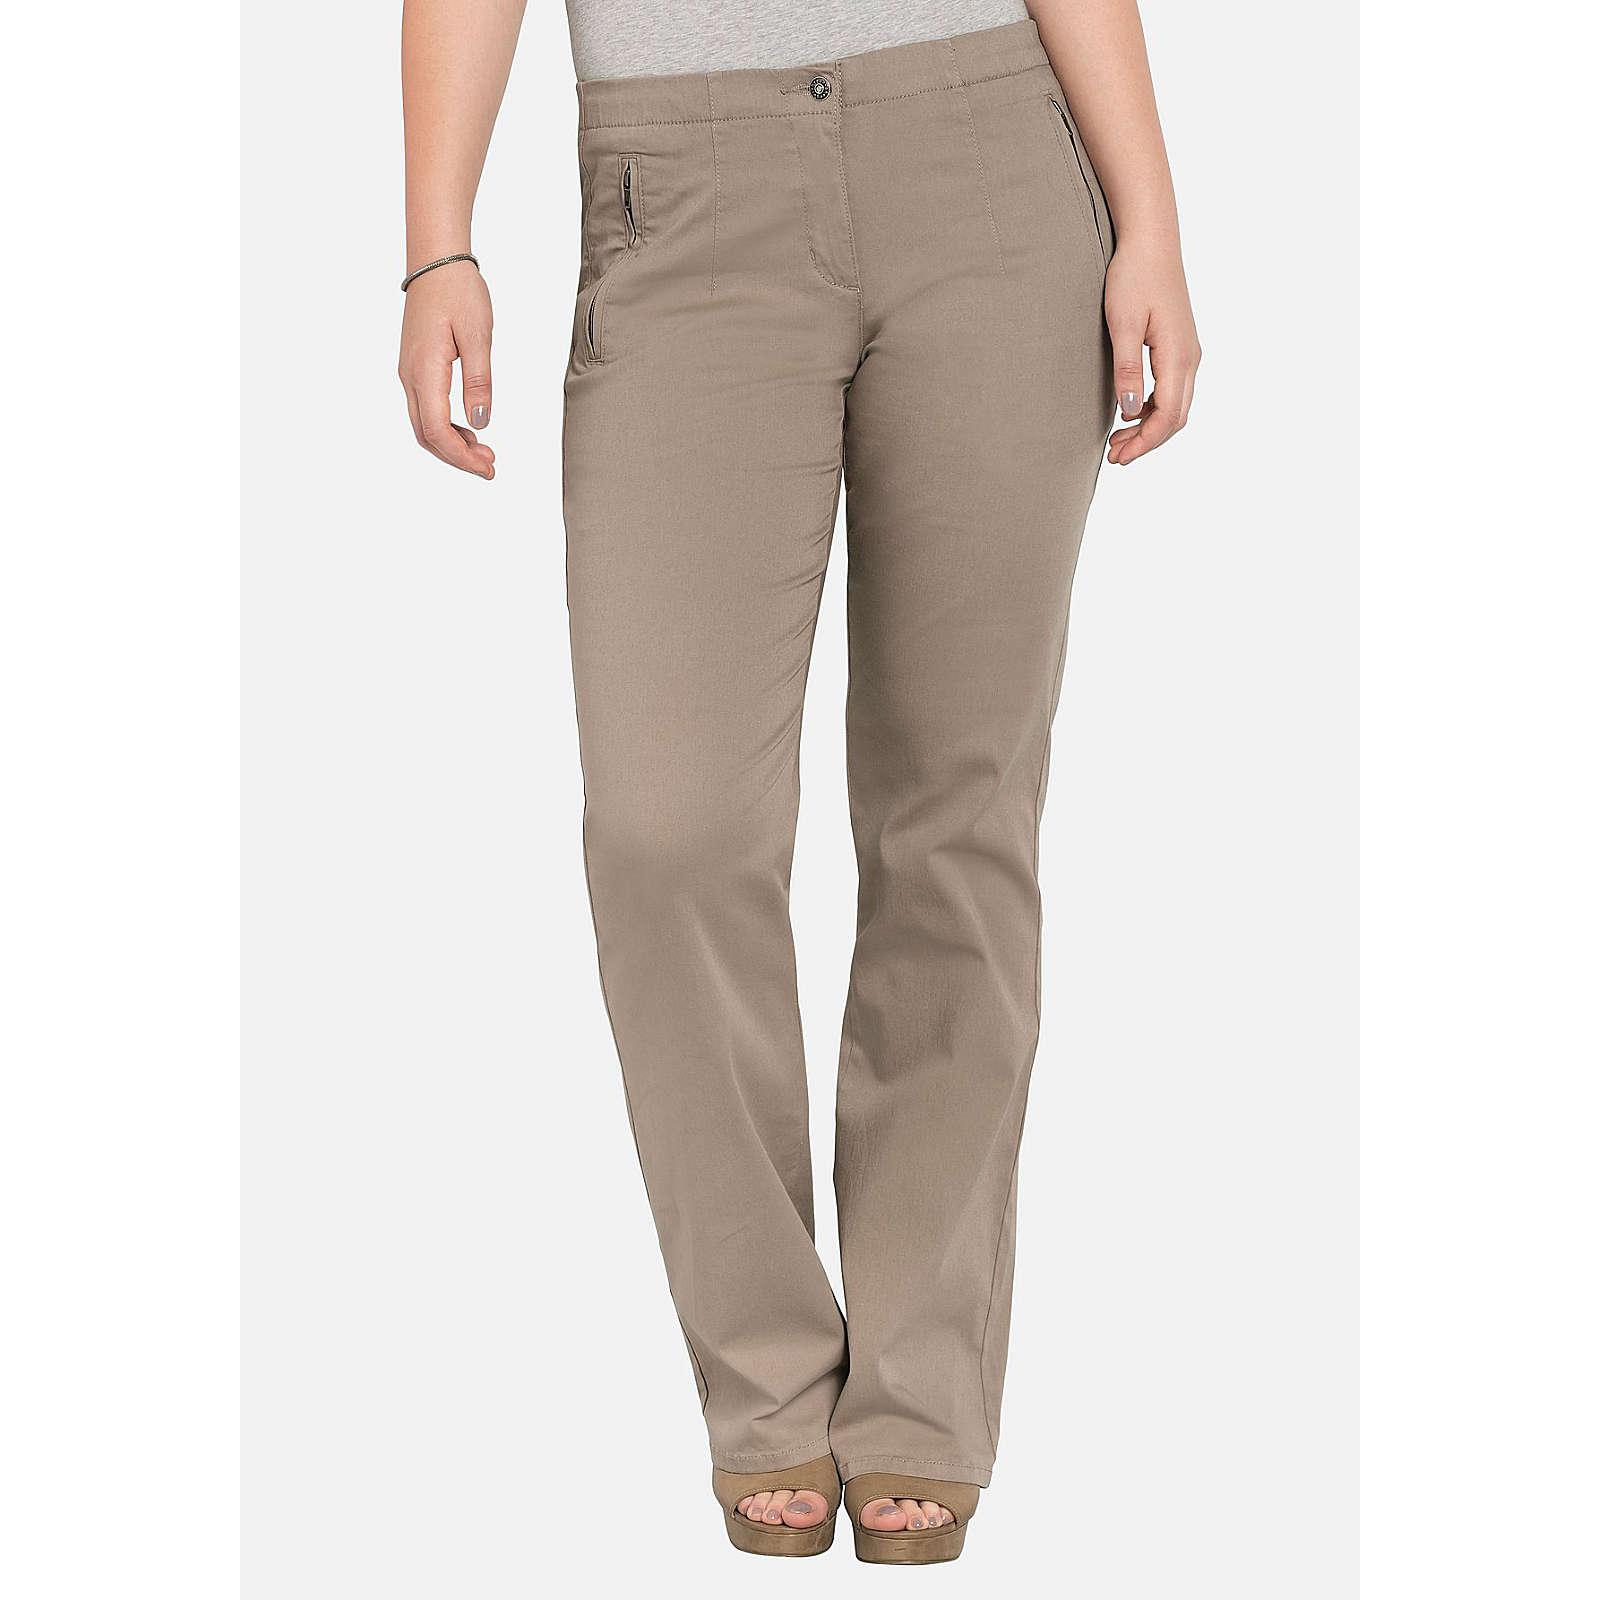 sheego Bootcut-Hose mit Reißverschlusstaschen Jeanshosen taupe Damen Gr. 50